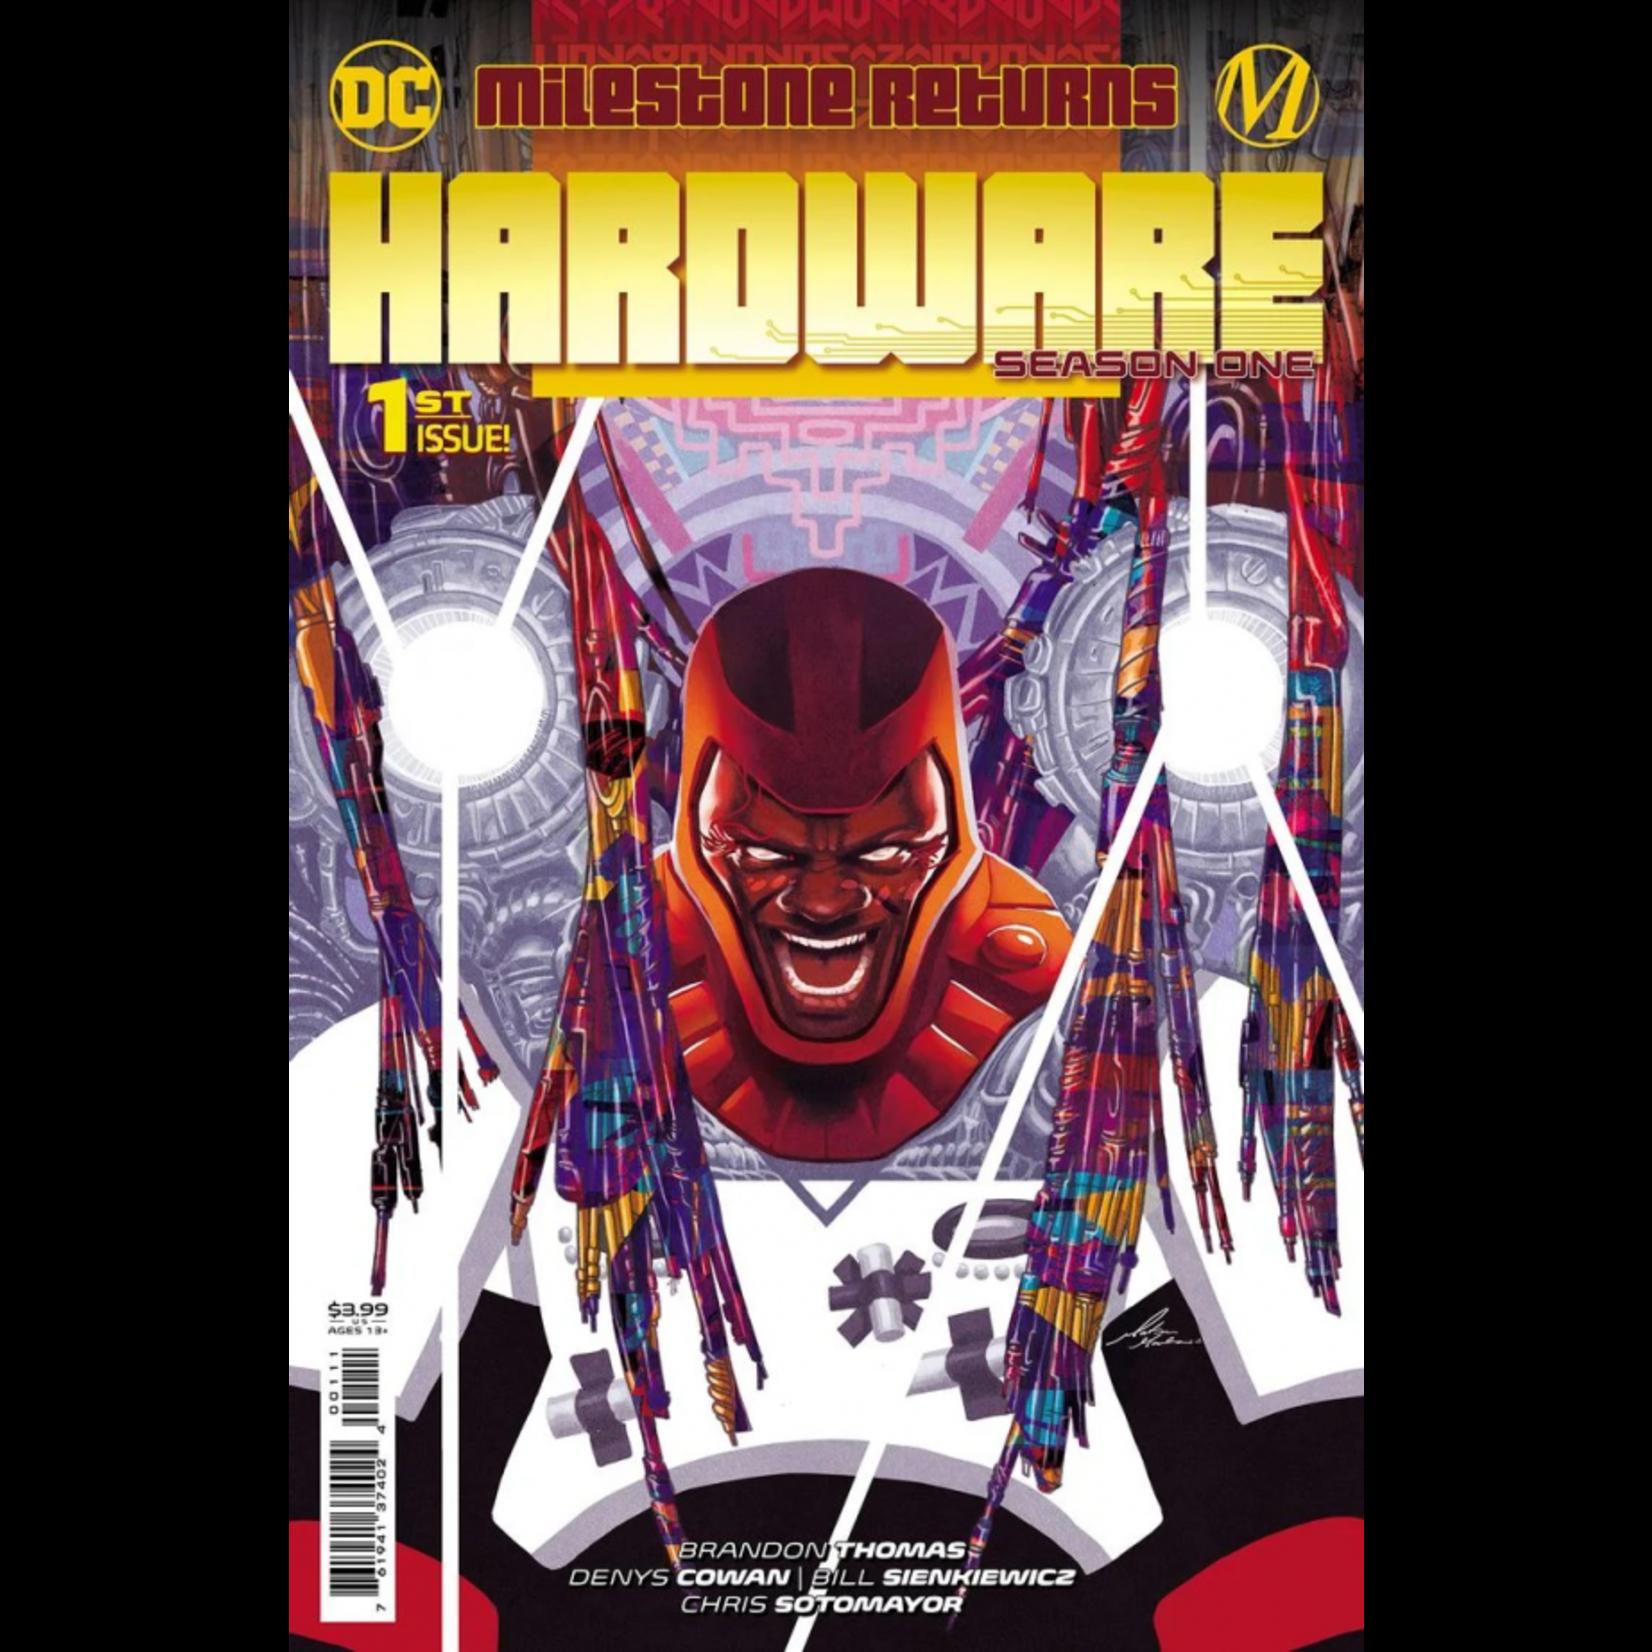 DC Comics Hardware Season one #1